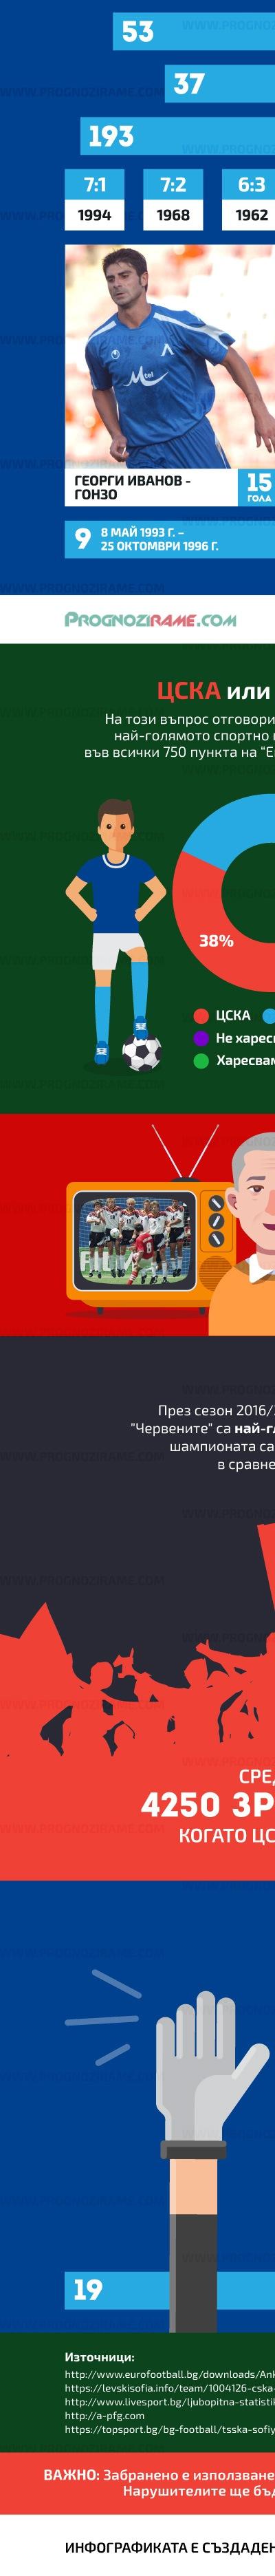 Левски срещу ЦСКА - prognozirame.com [4]